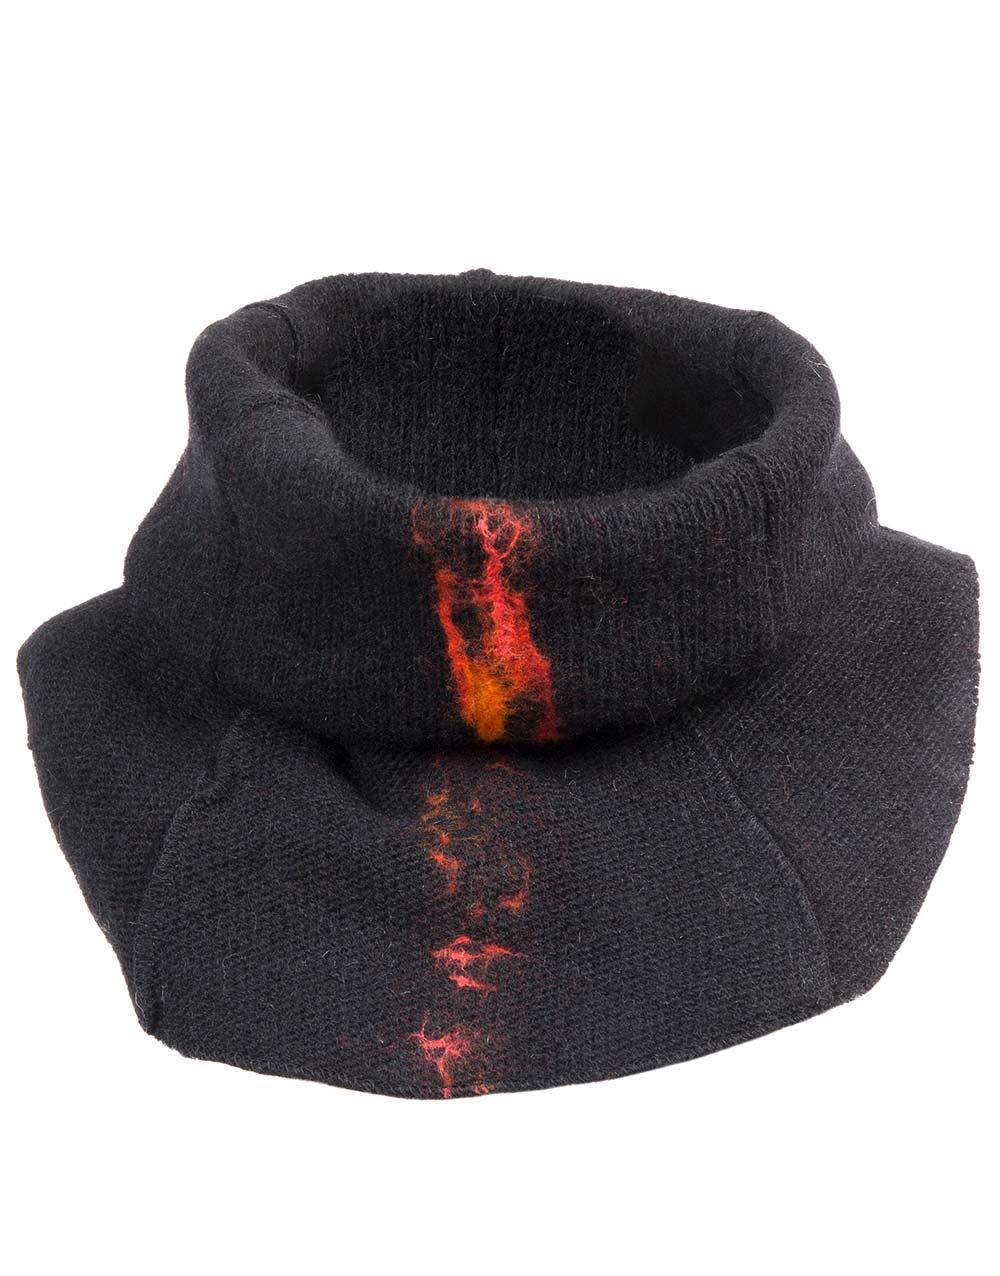 lava neck-warmer, black, gjoska.is